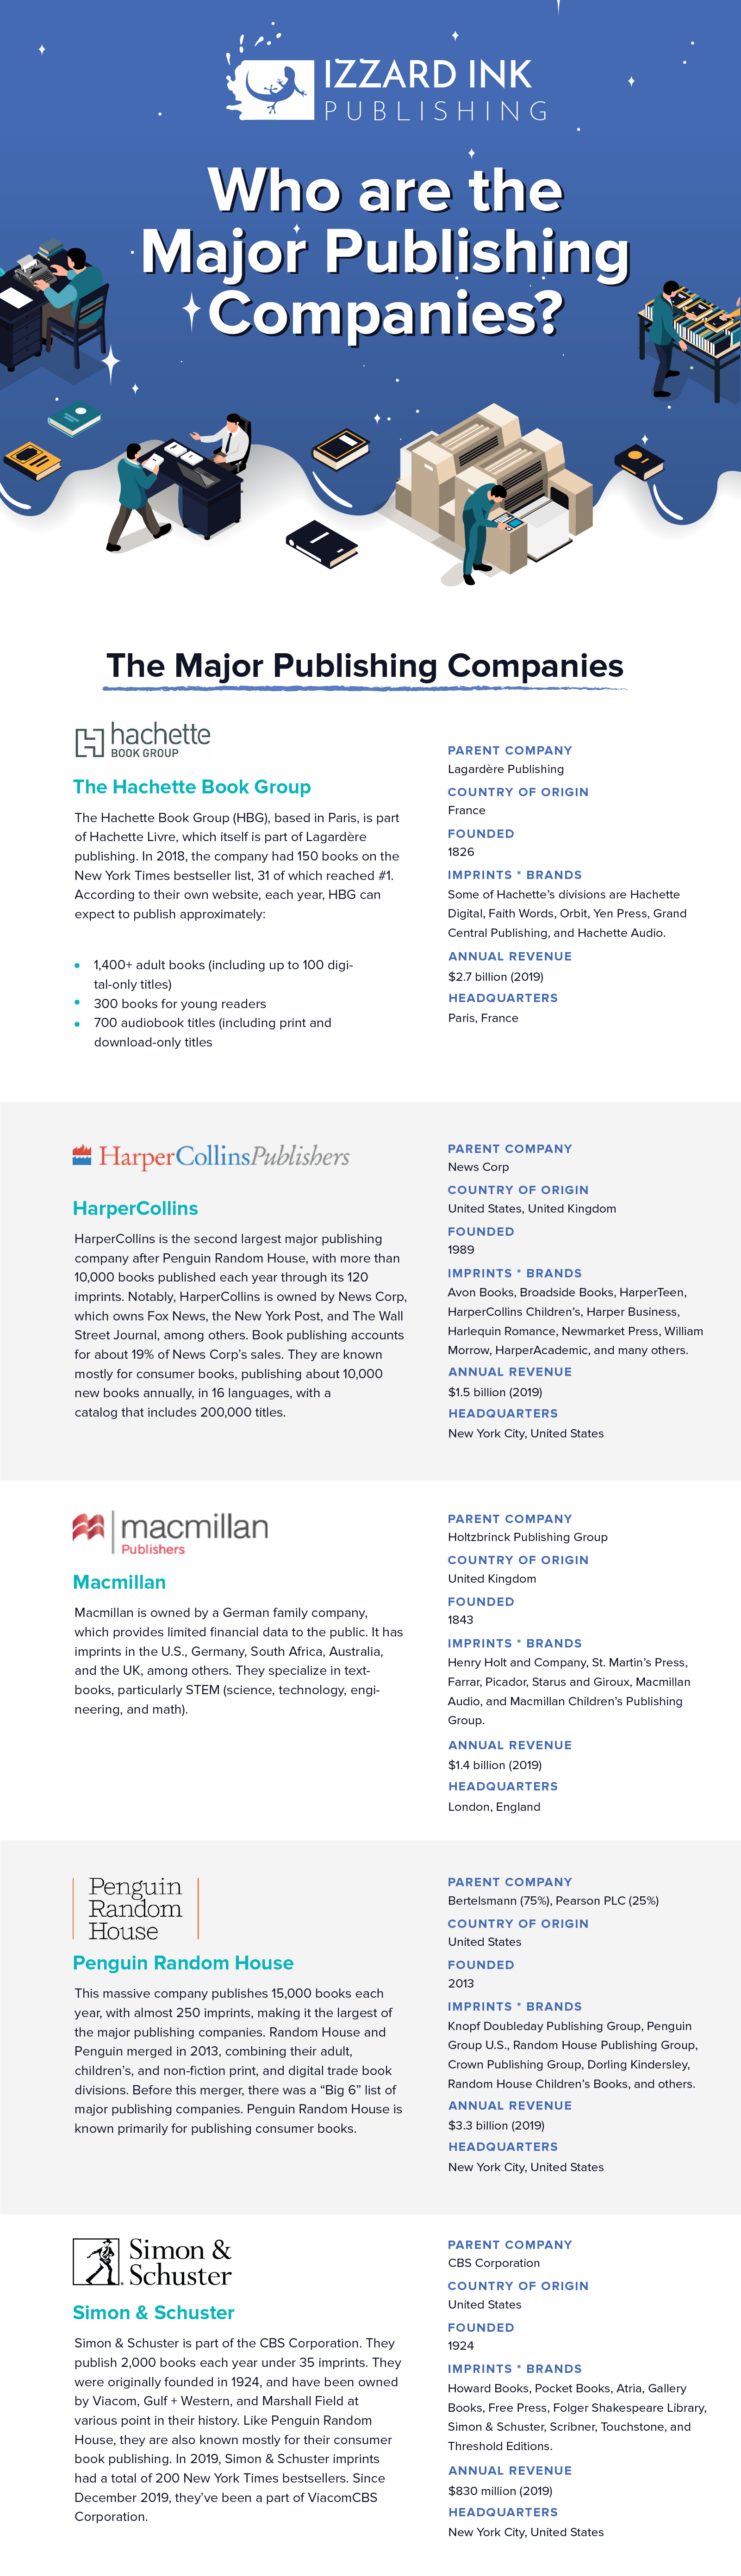 Major Publishing Companies Infographic